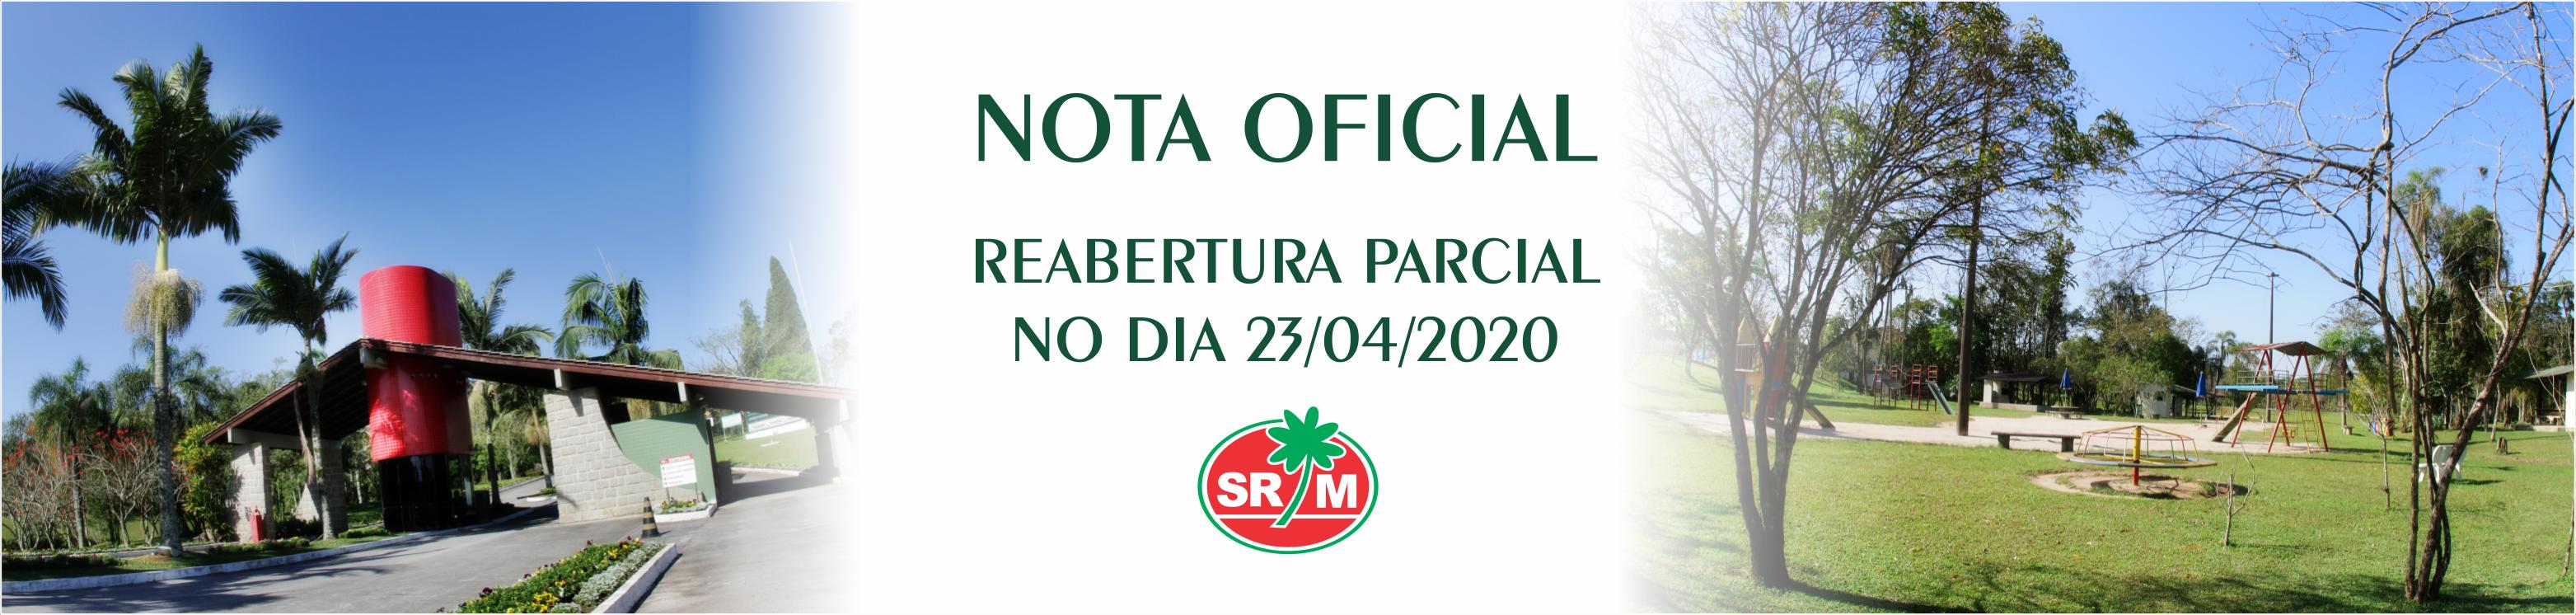 BANNER-REABERTURA2